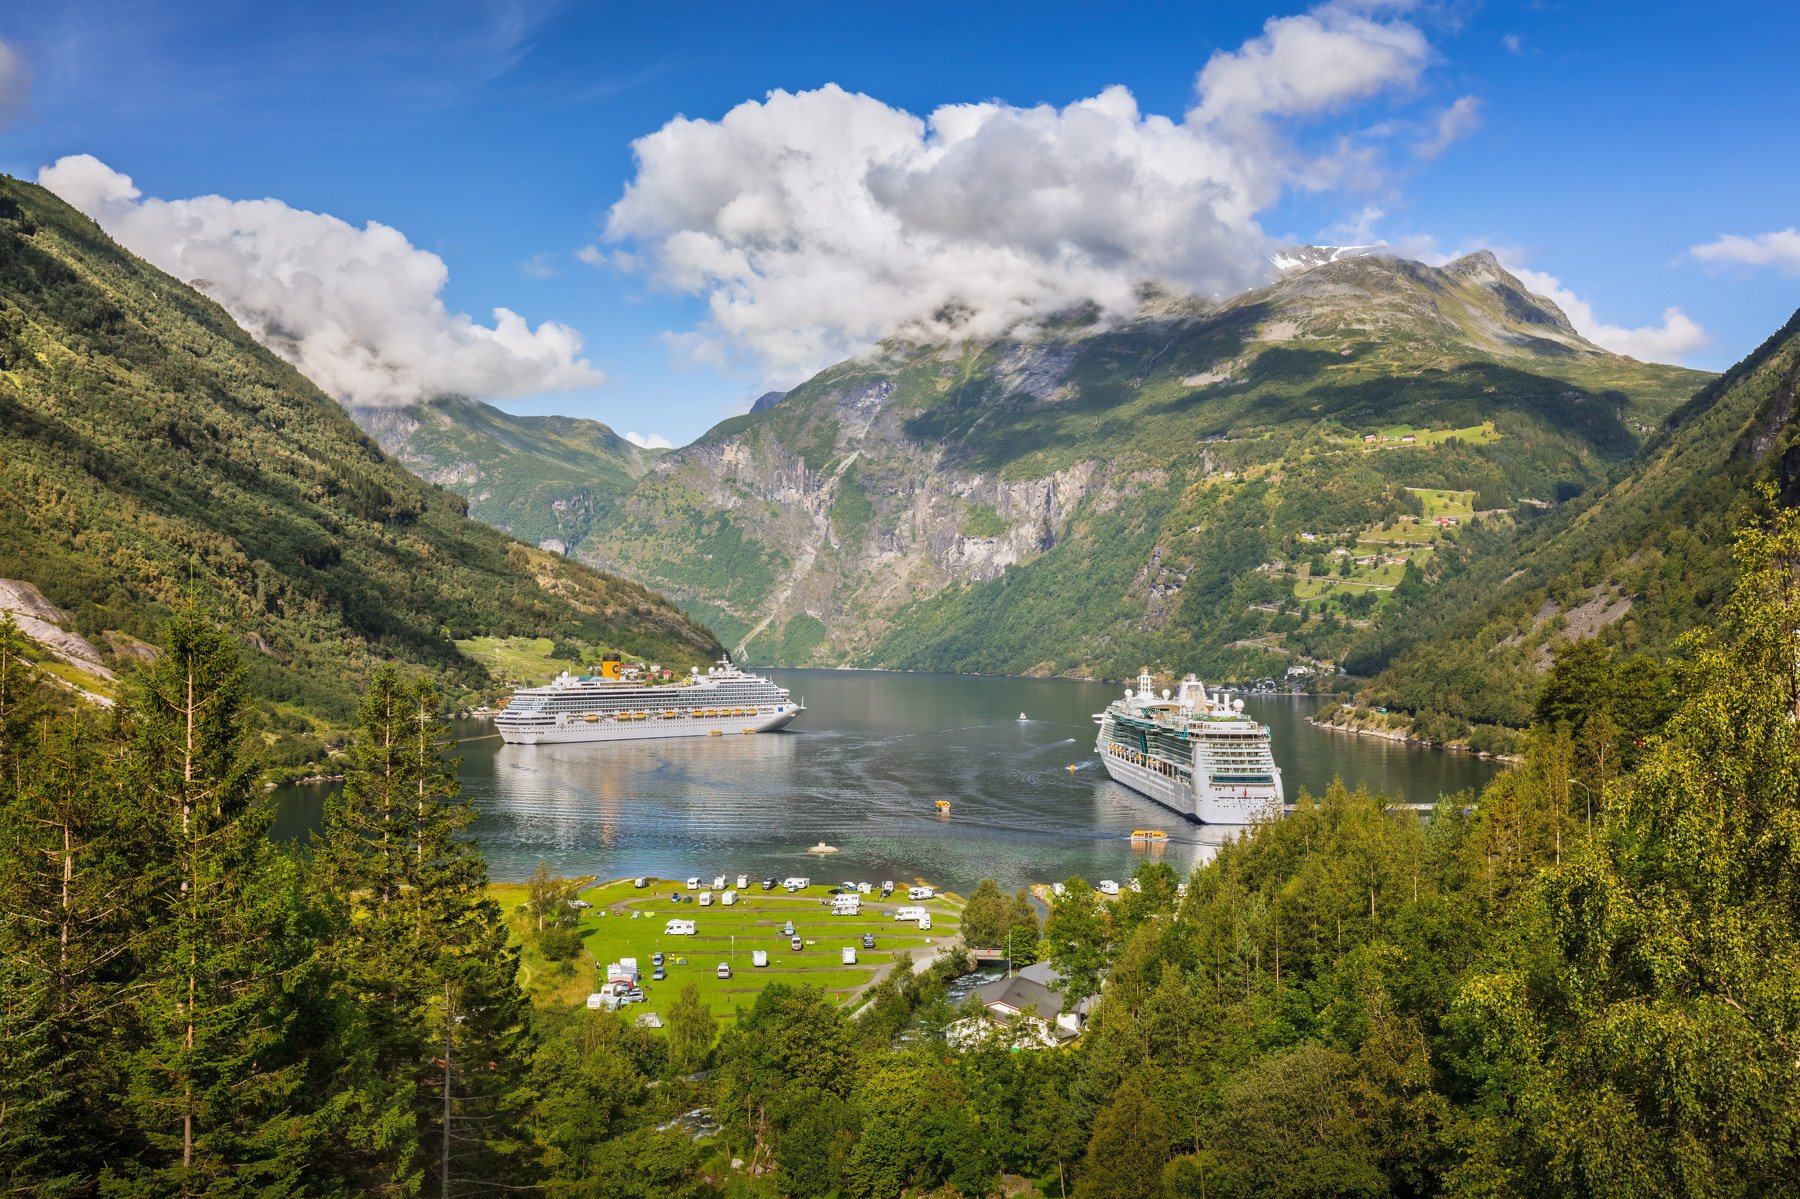 гейрангер, норвегия, горы, порт, море, корабли, облака,, Marat Max (Марат Макс)